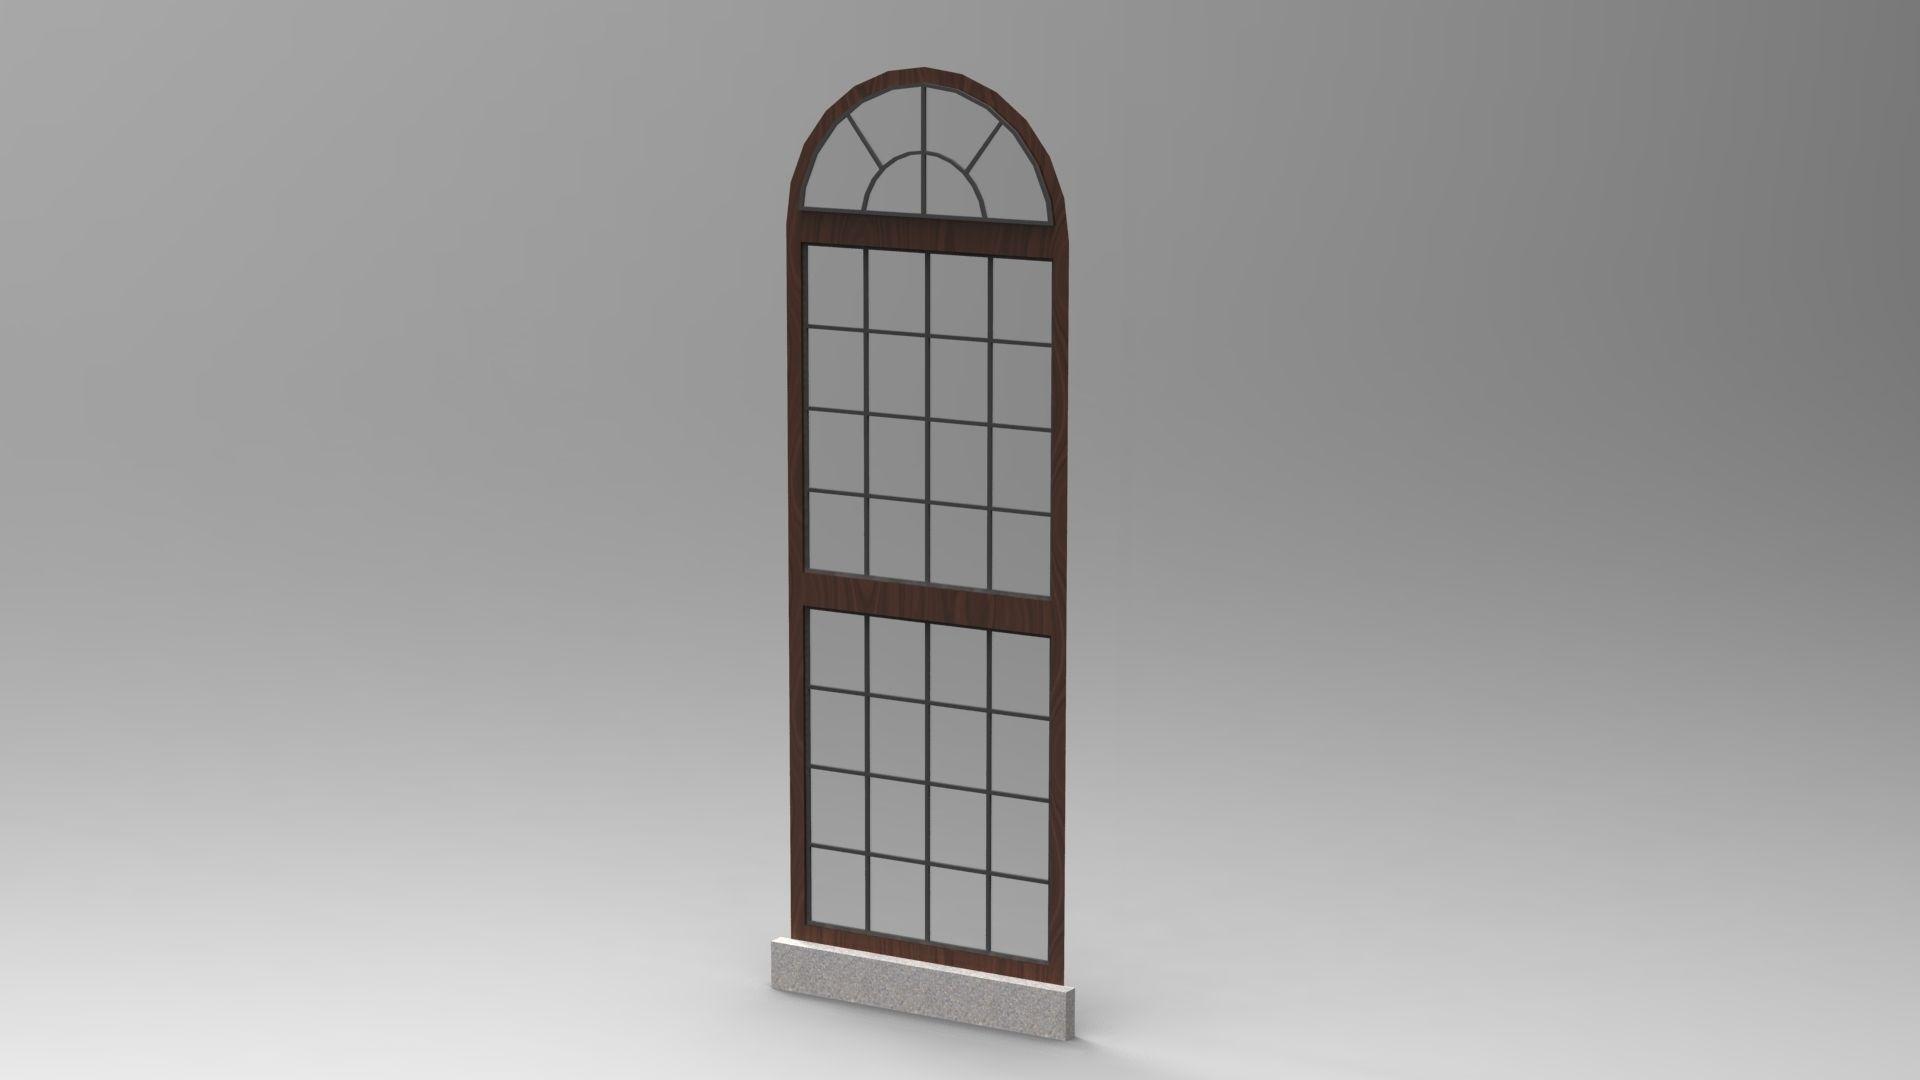 Window design 3 3d model skp for Window 3d model